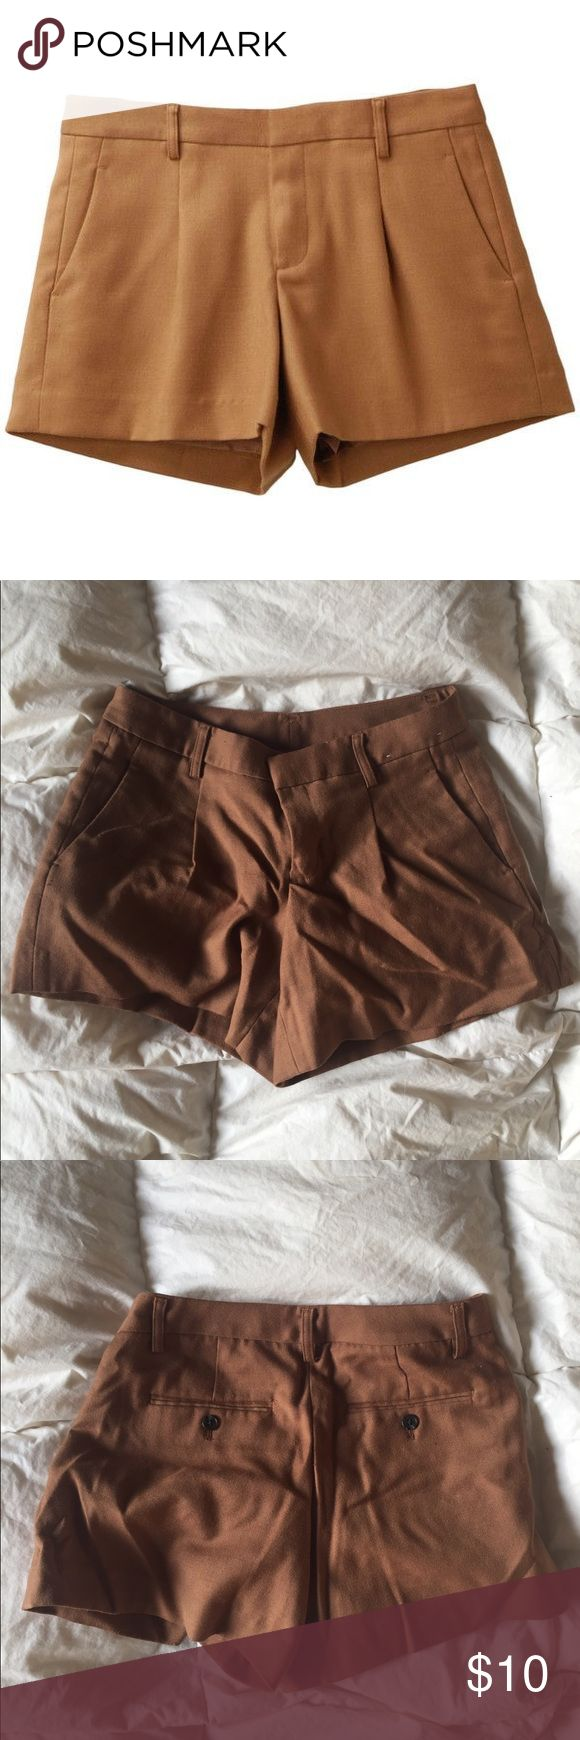 Uniqlo Paperboy Shorts Uniqlo Brown Paperboy Shorts. Never worn! Uniqlo Shorts